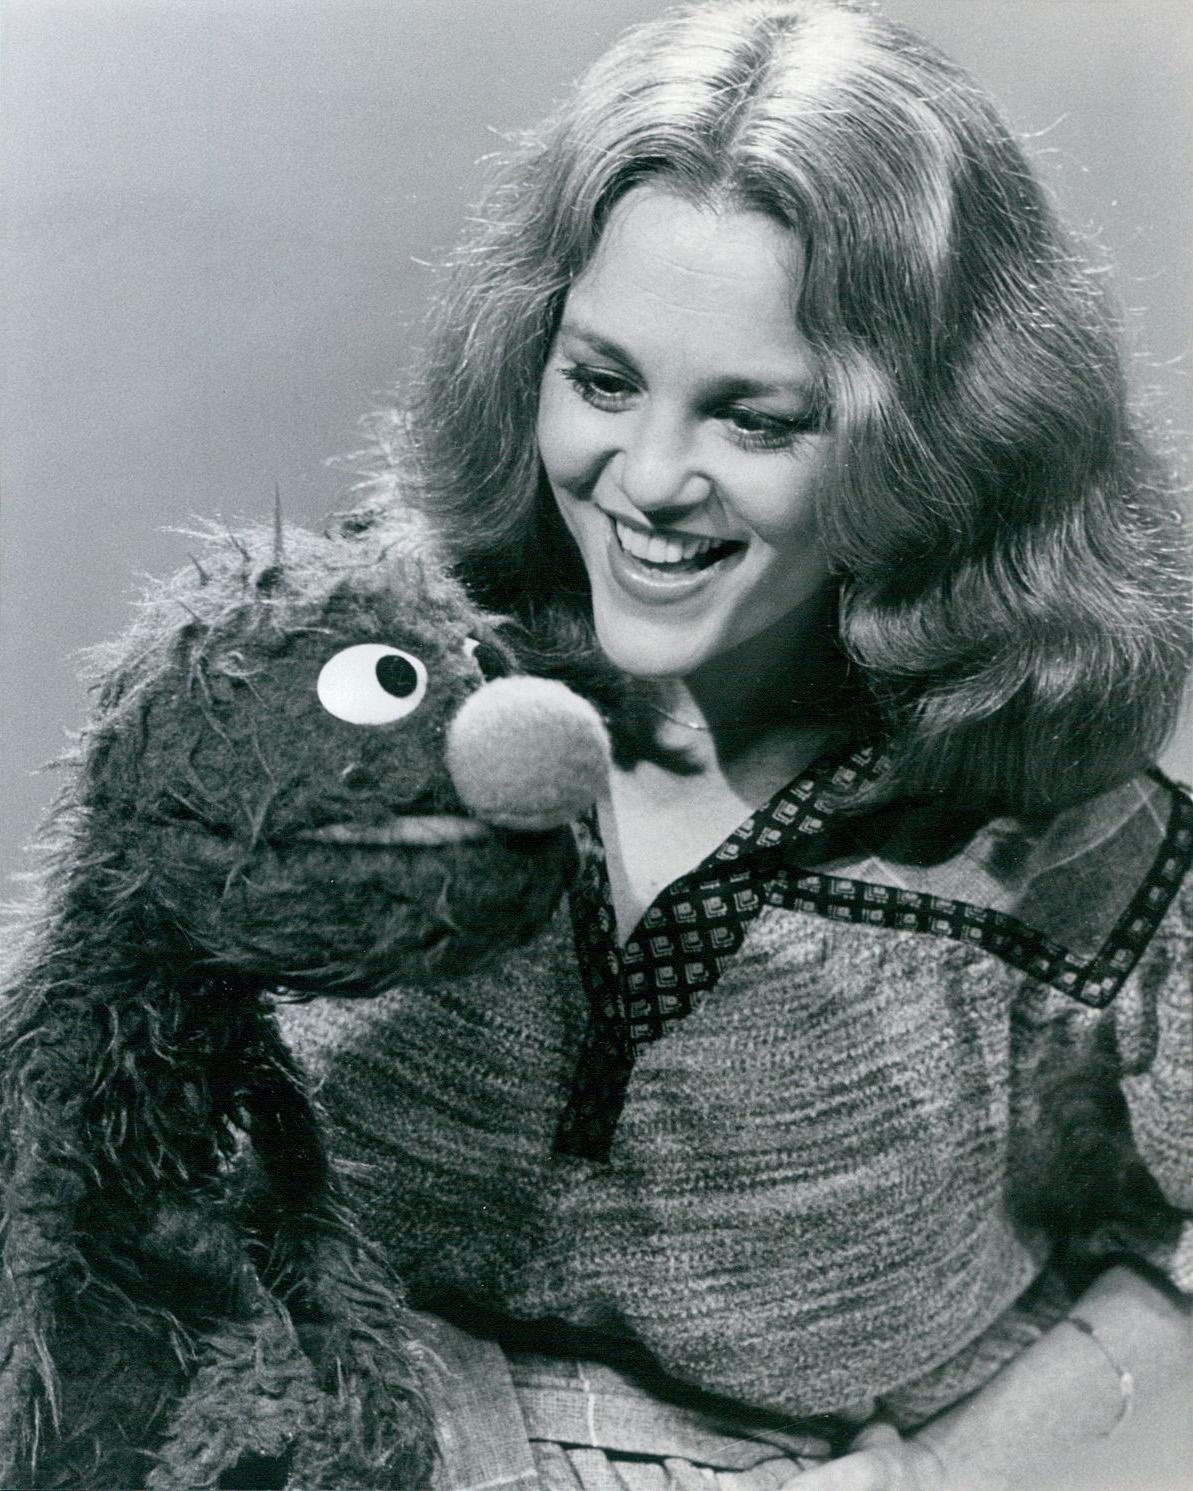 Madeline Kahn and grover